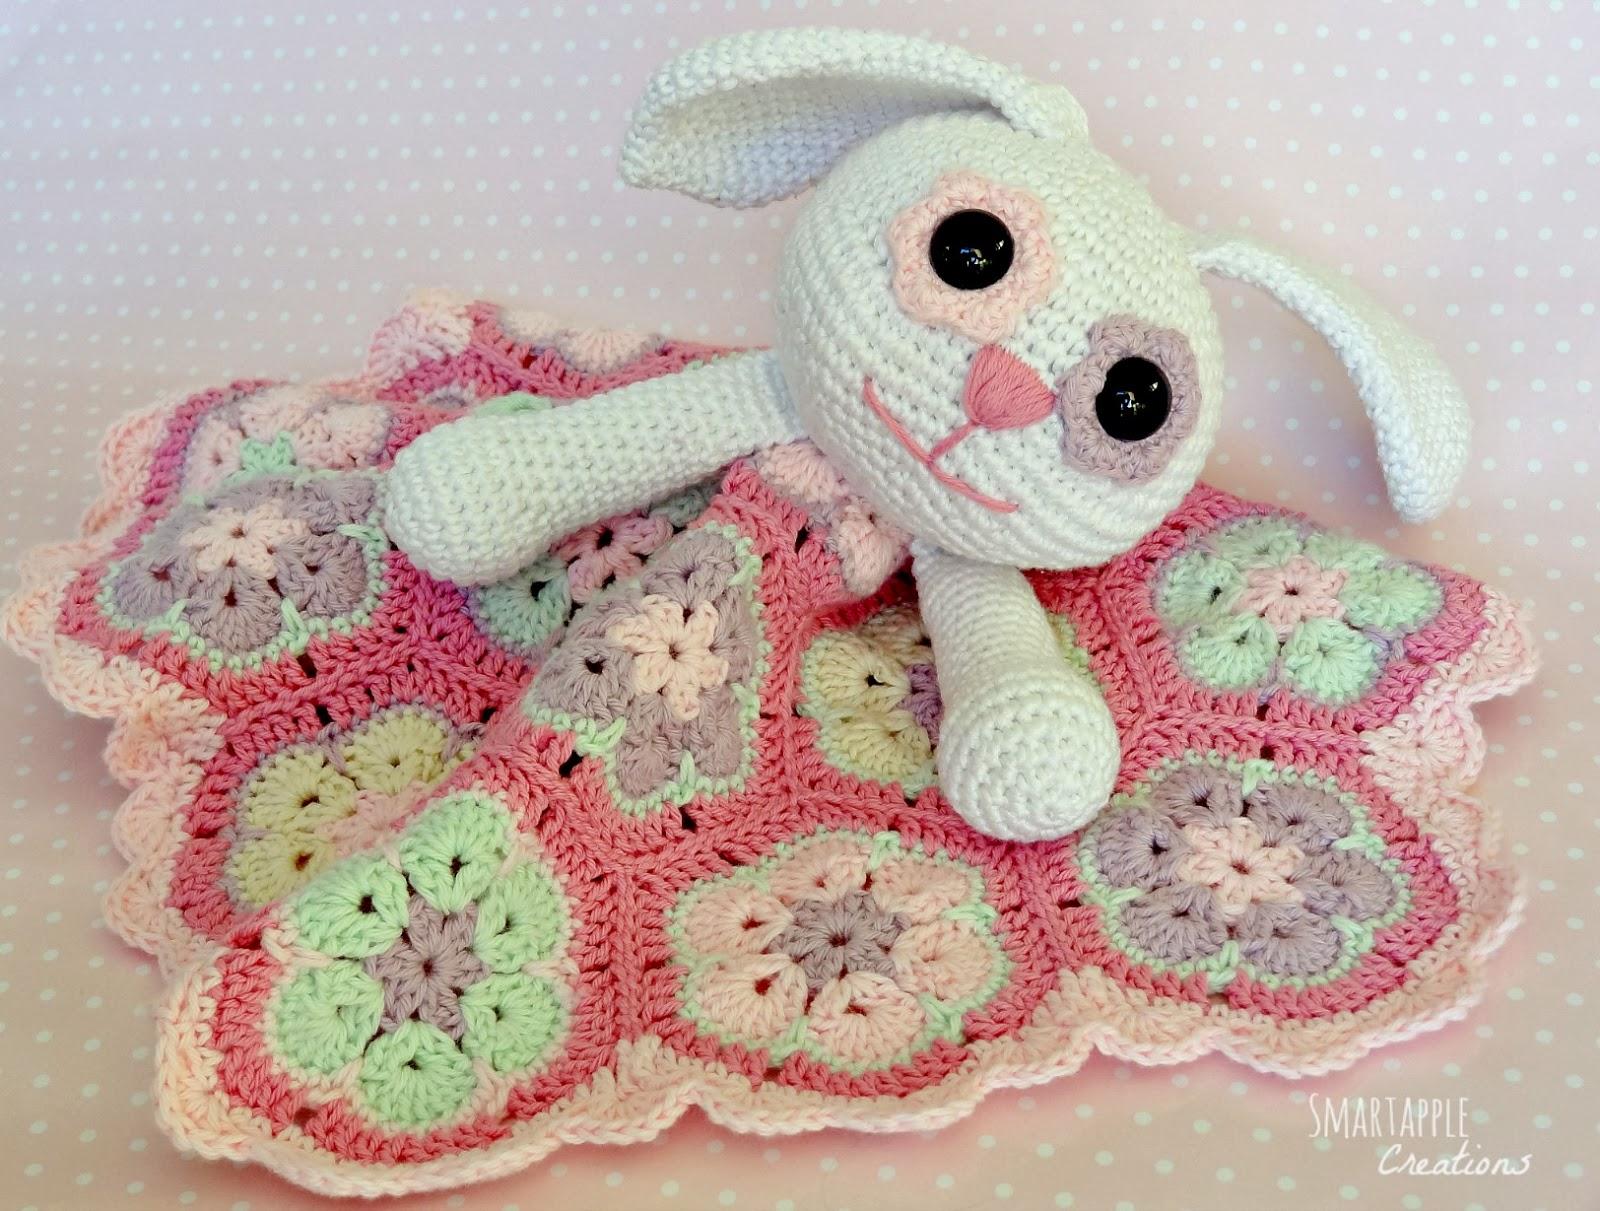 Smartapple Creations - amigurumi and crochet: Crochet bunny lovey ...